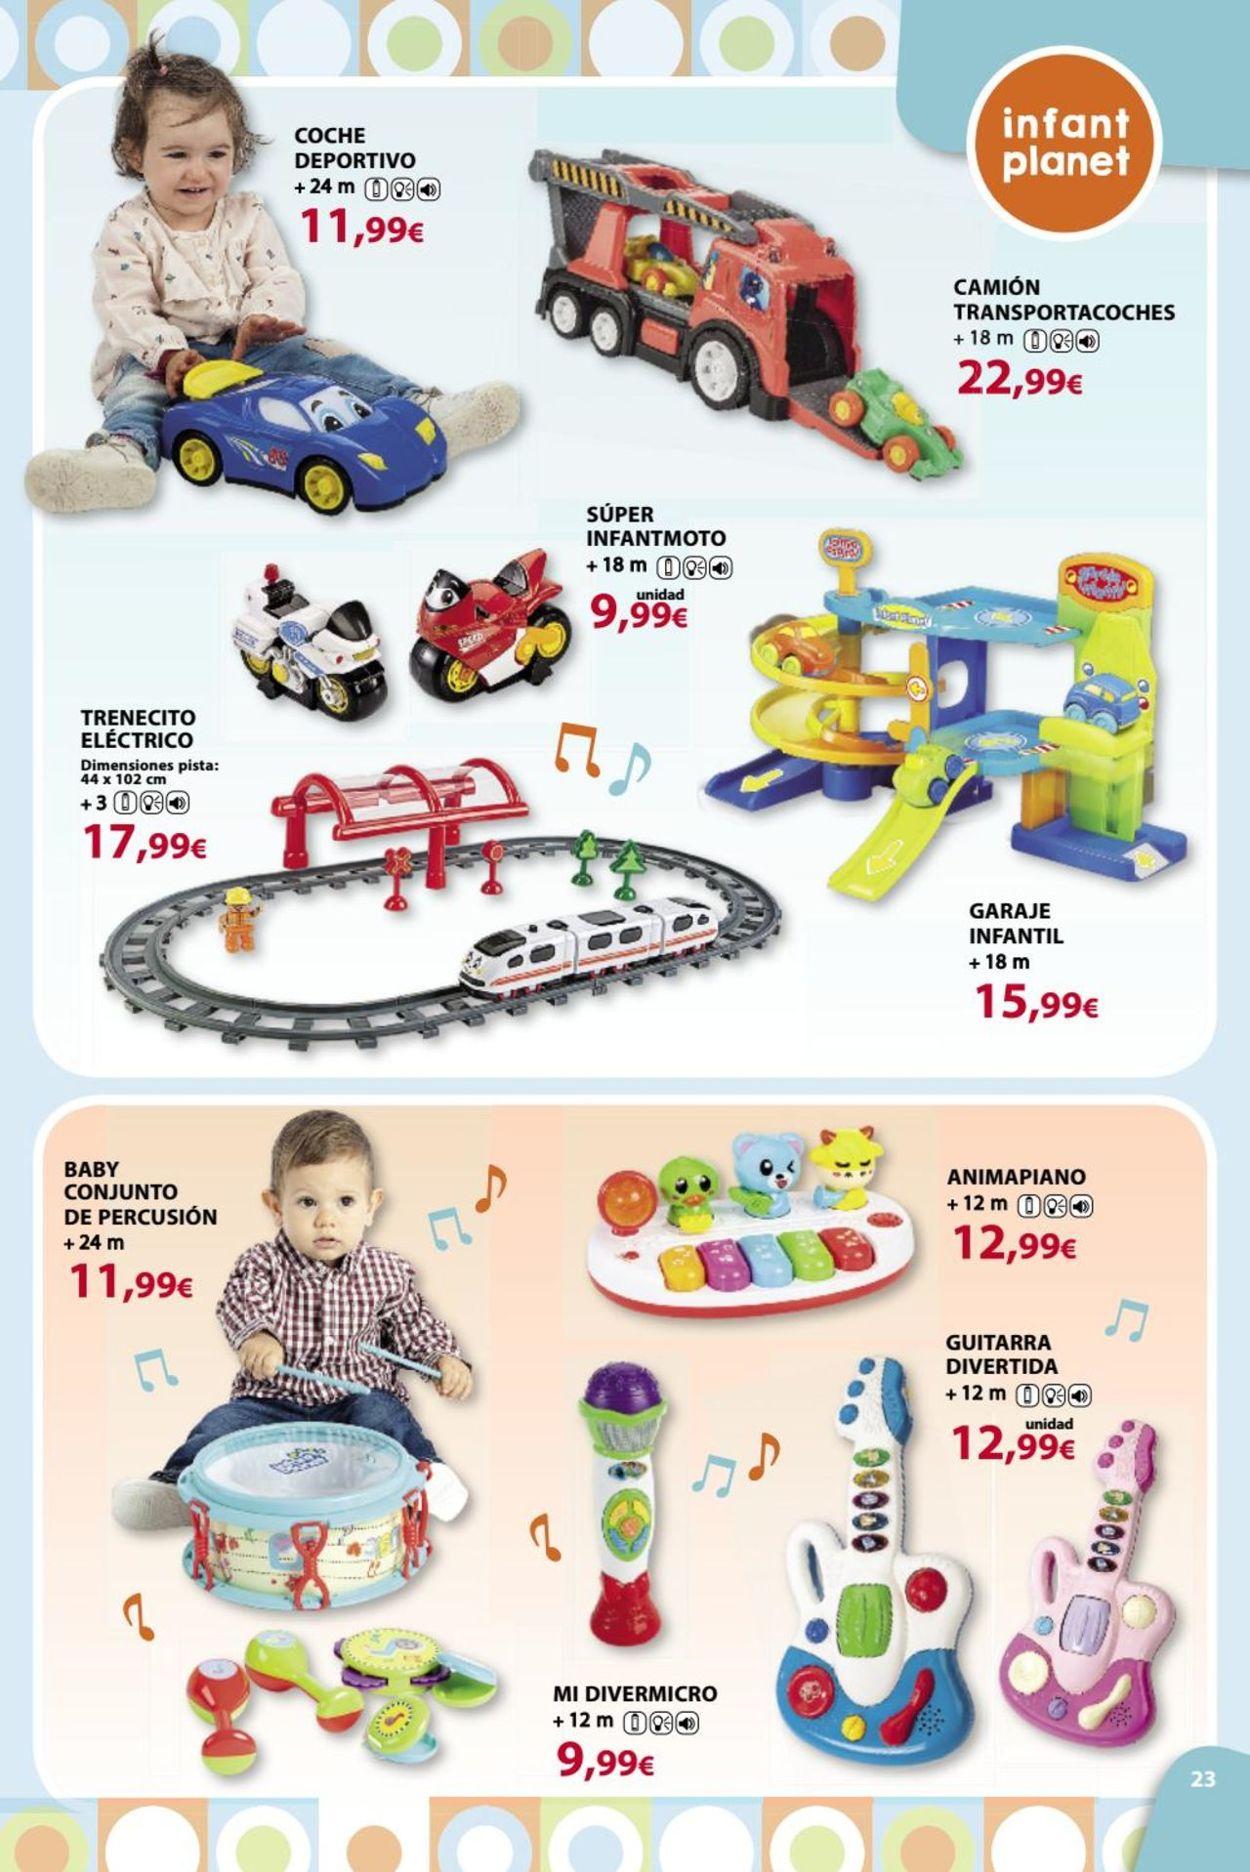 Toy Planet Folleto - 08.06-31.07.2019 (Página 23)